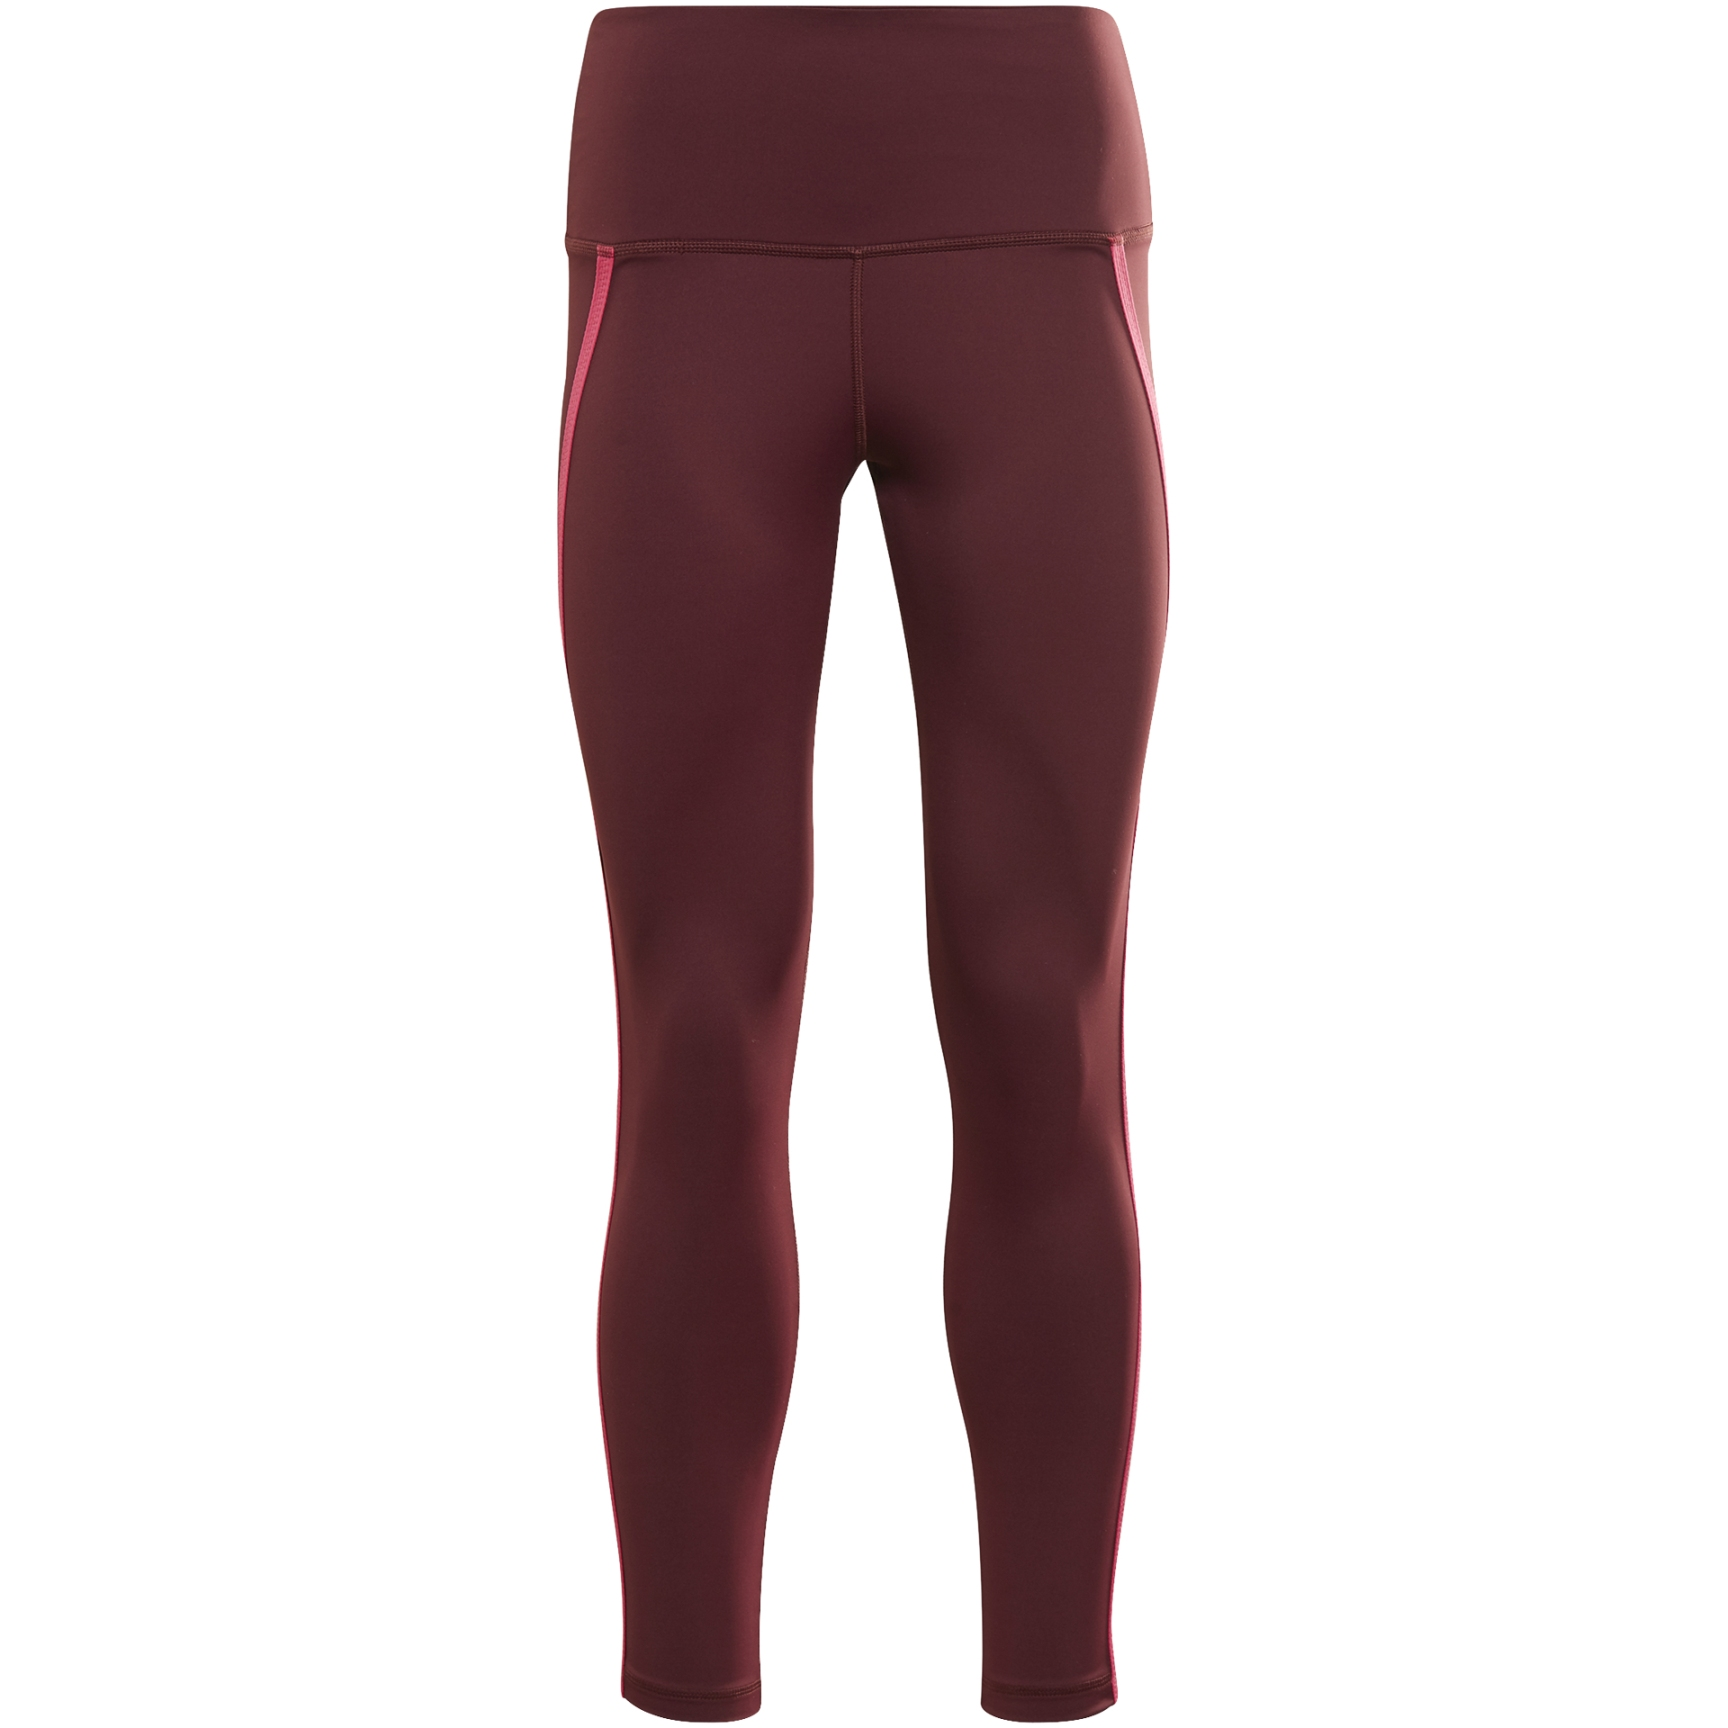 Reebok Studio Taped Leggings Women's Tight - maroon